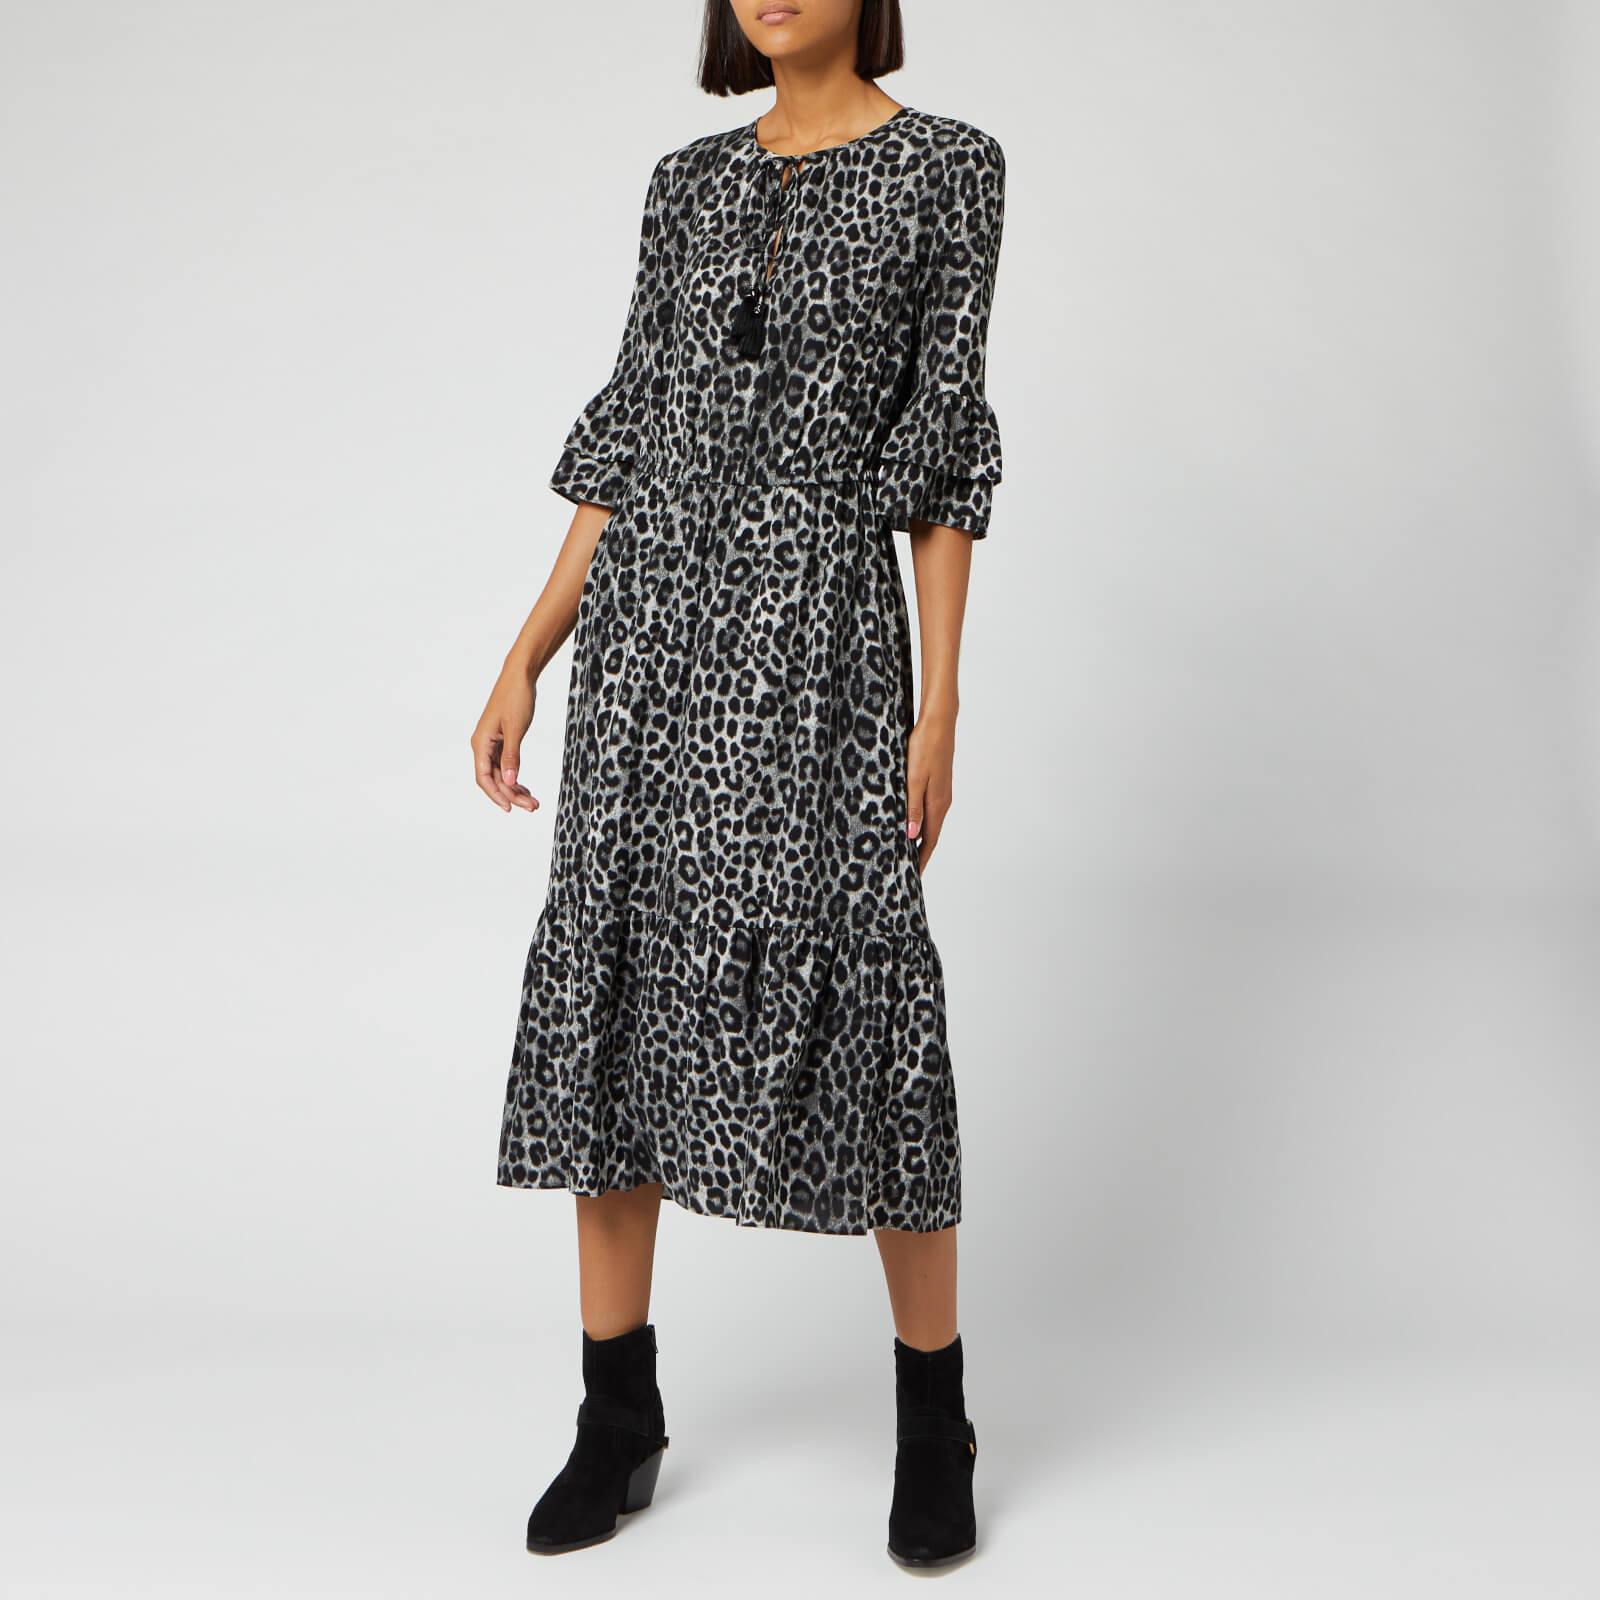 MICHAEL MICHAEL KORS Women's Mega Cheeta Dress - Gunmetal - US 6/UK 10